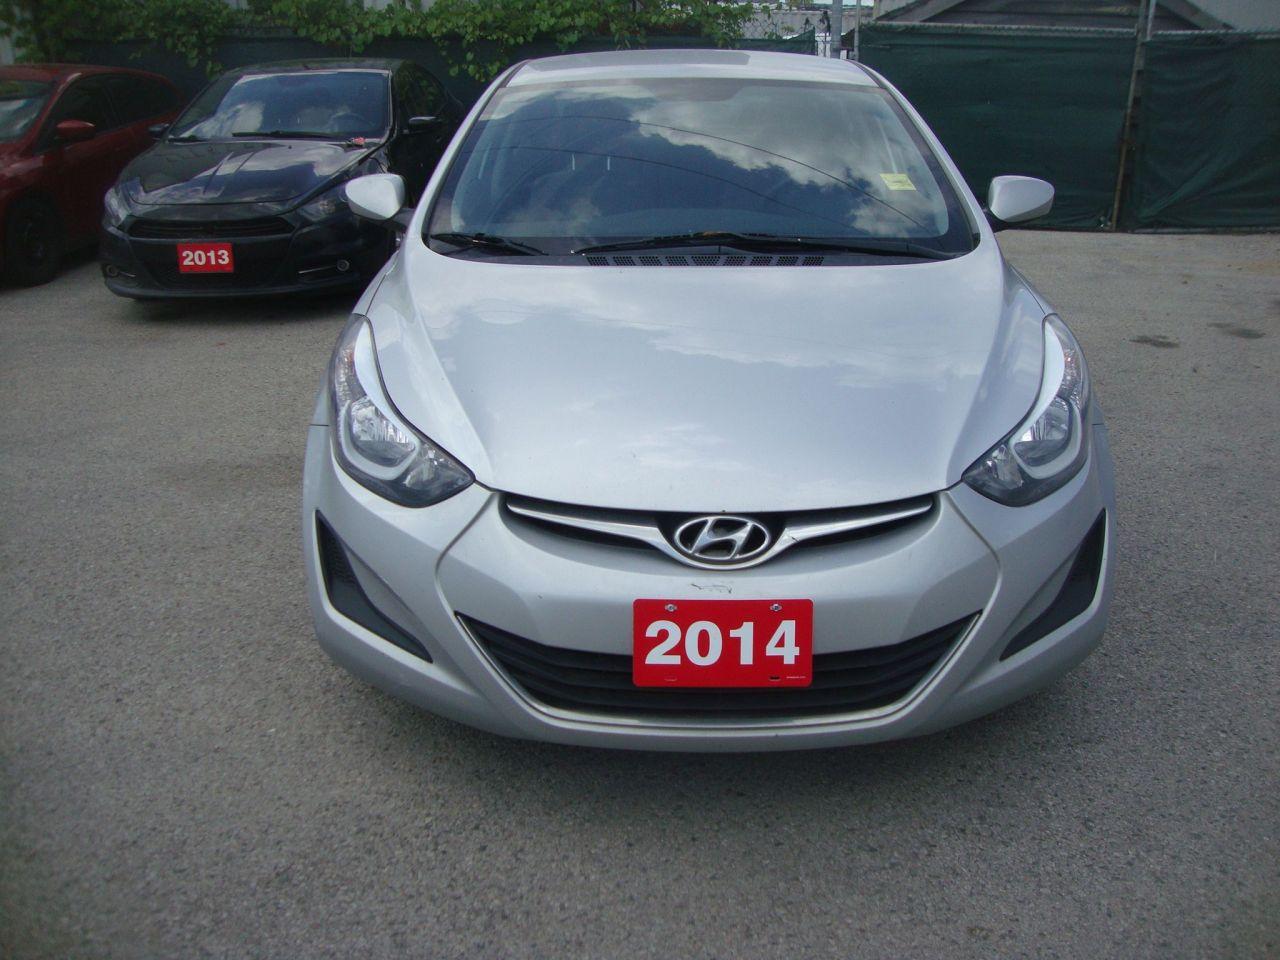 2014 Hyundai Elantra